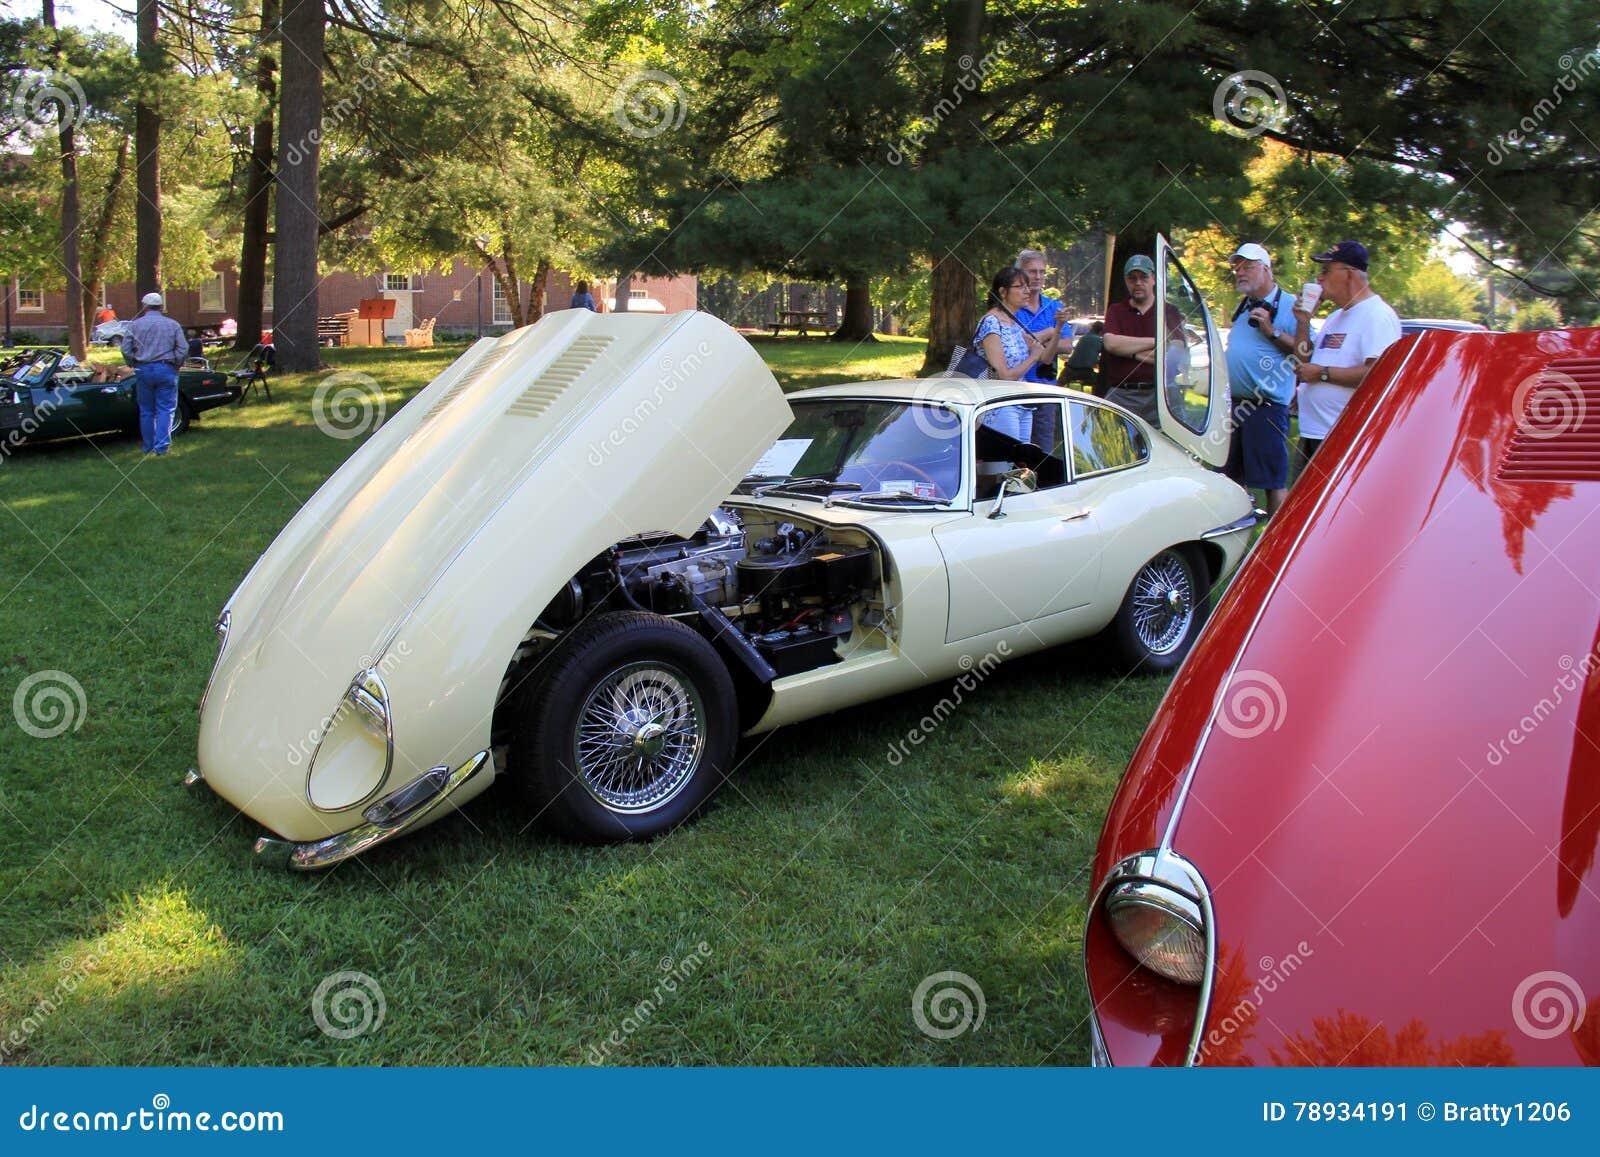 Exotic Cars On Display Saratoga Automobile MuseumNew York - Saratoga auto museum car show